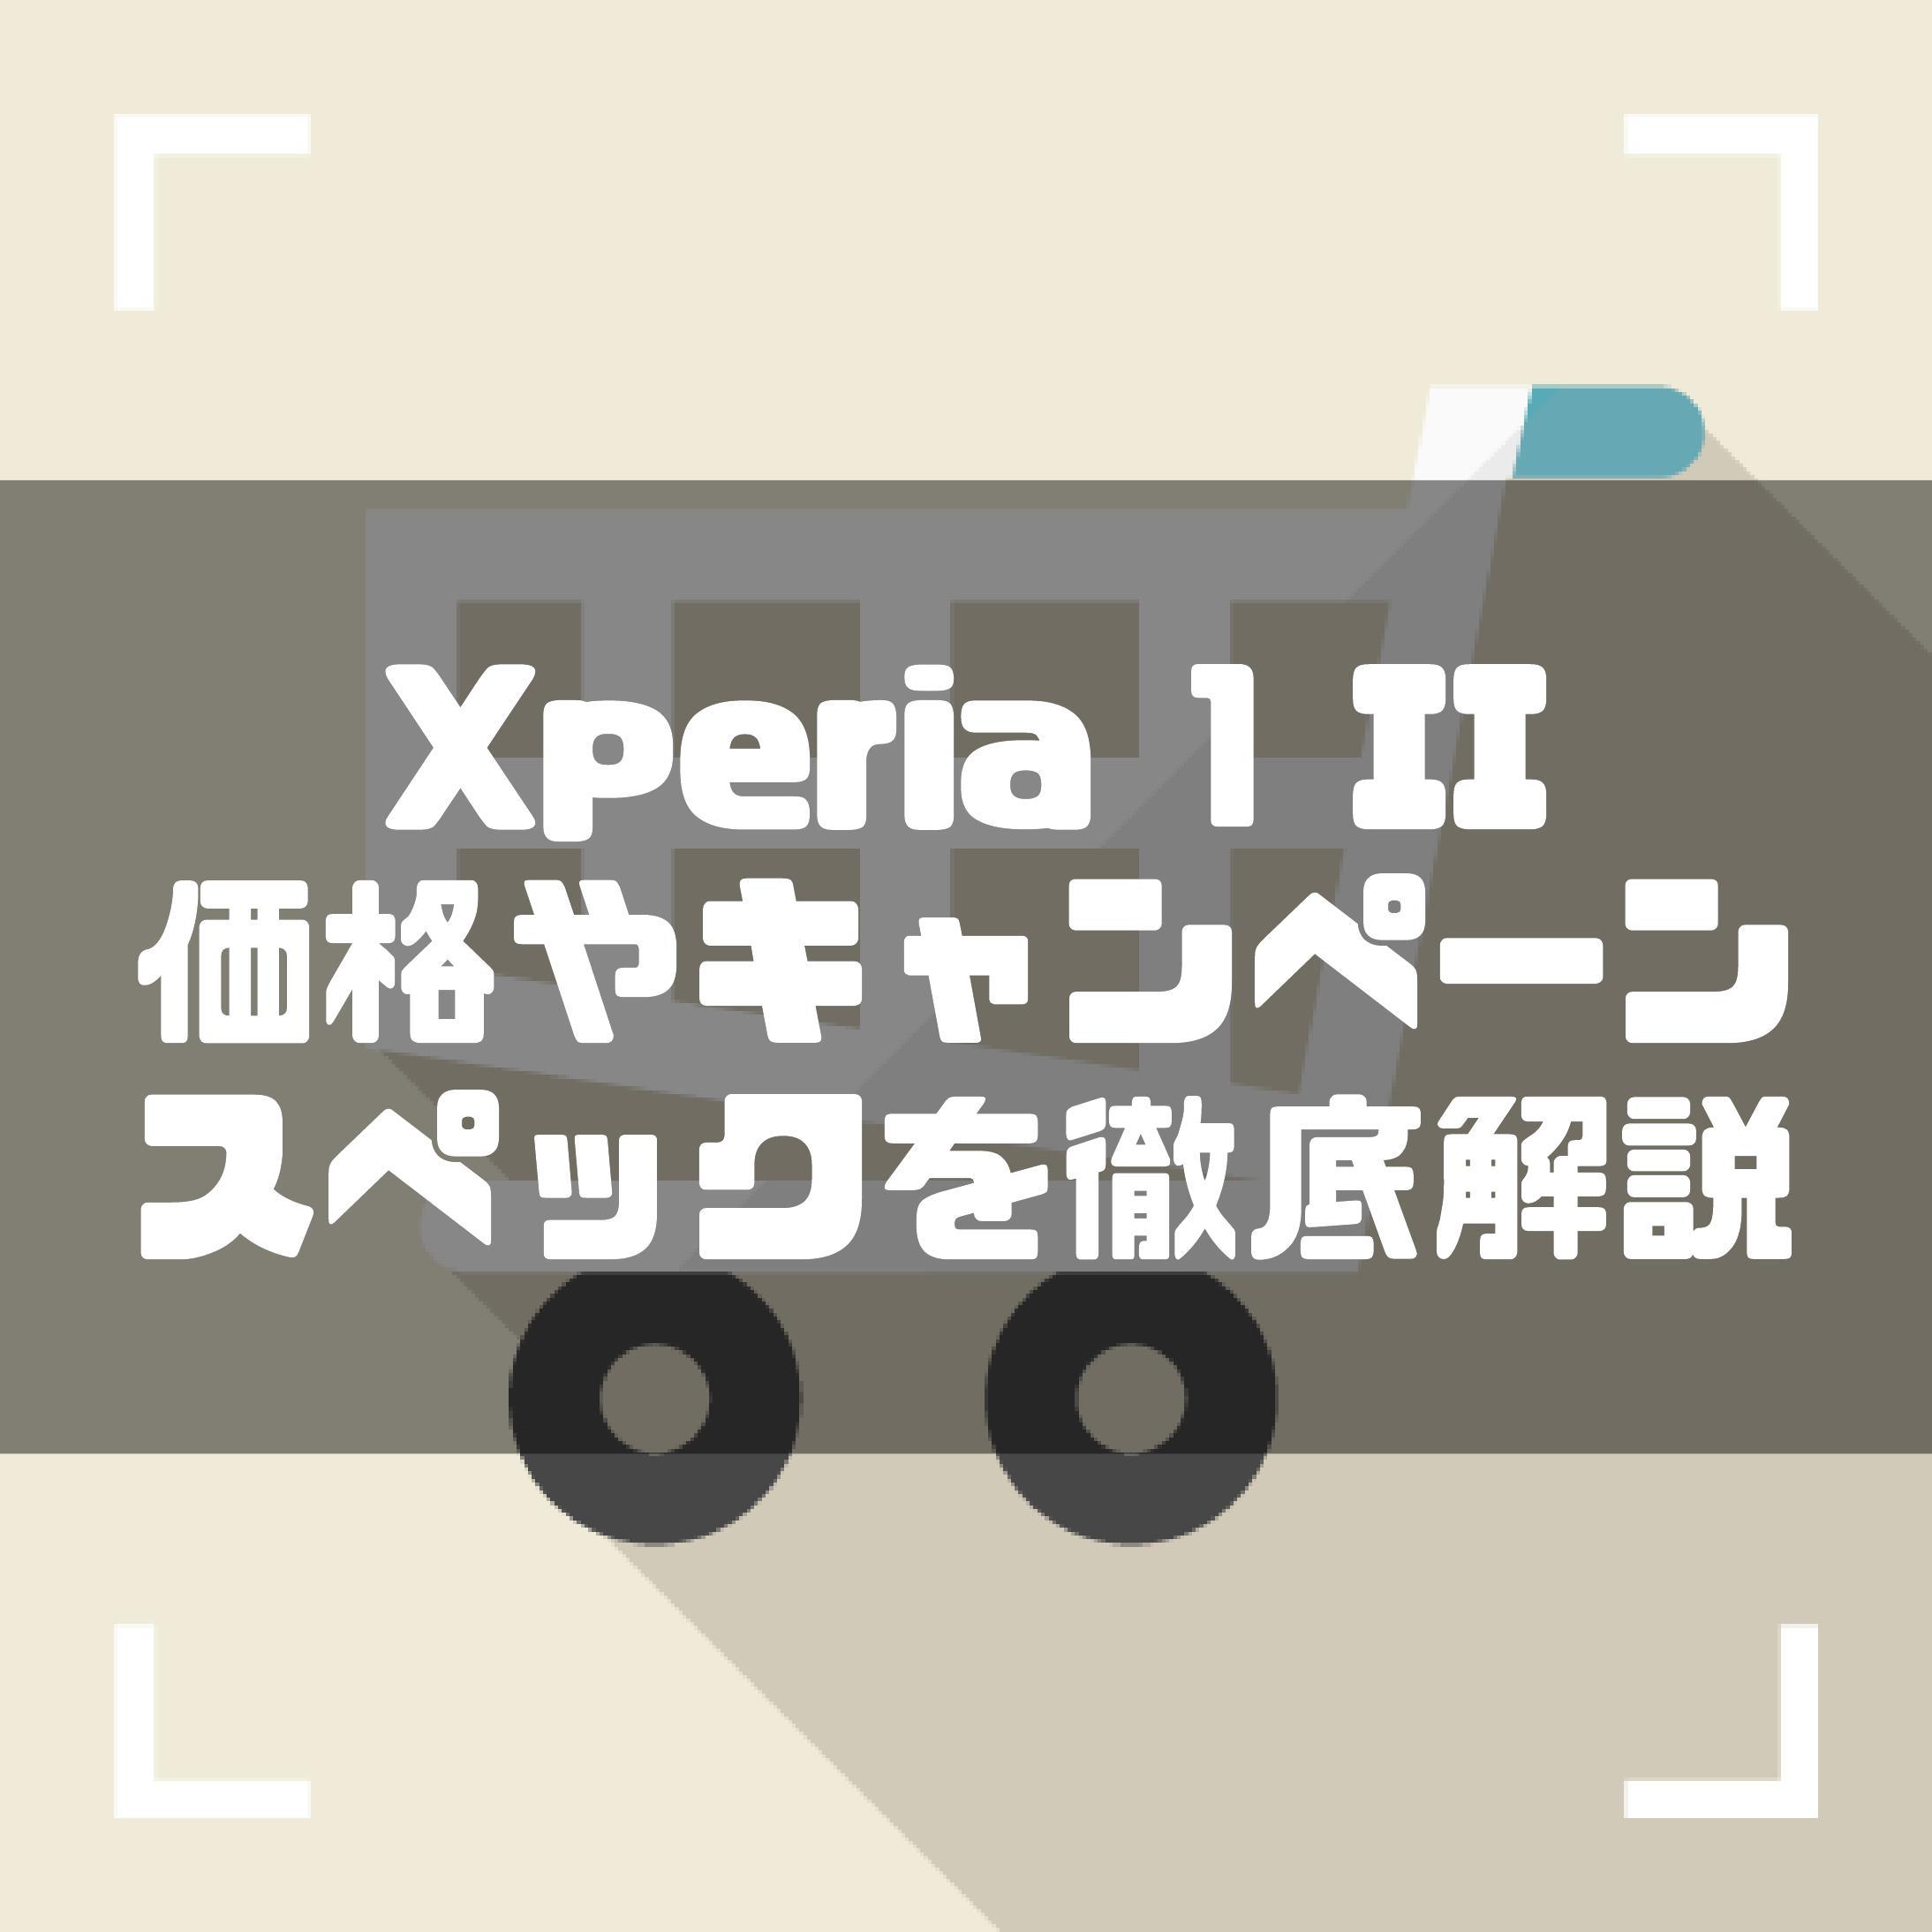 Xperia 1 II のスペックを徹底レビュー!価格やキャンペーン情報、simフリー版についても解説!